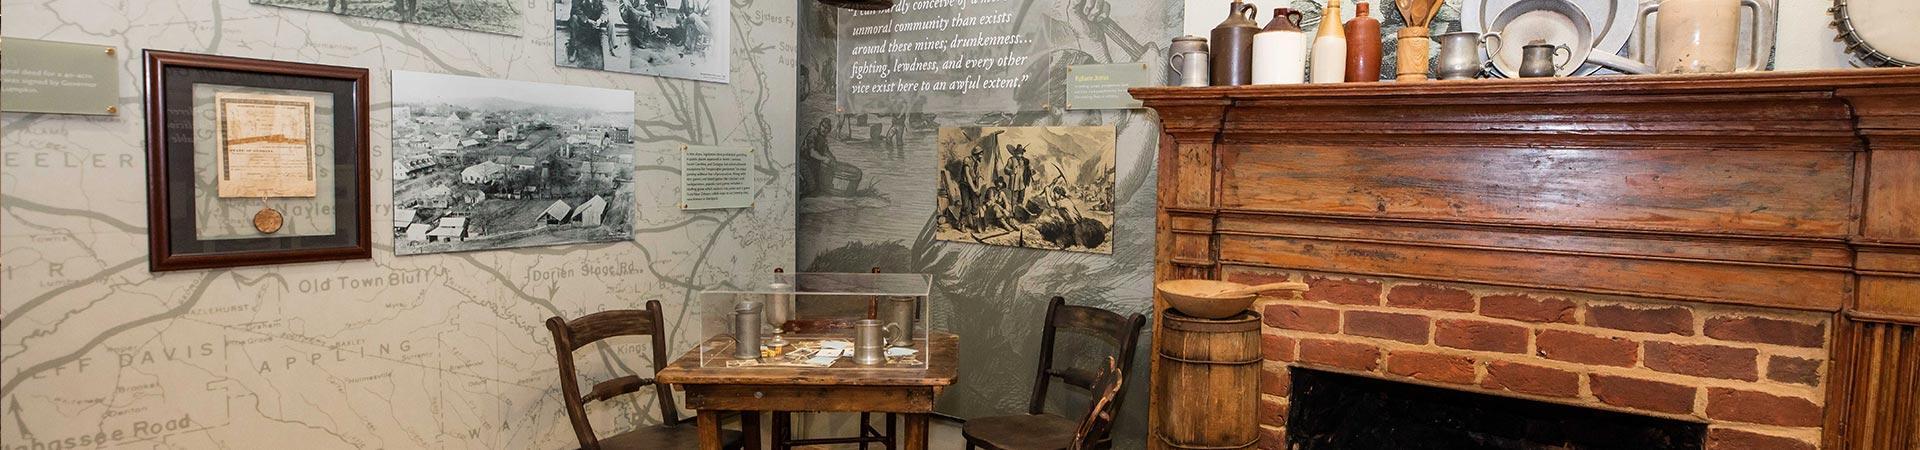 gold-museum-dahlonega-new-exhibits-slider5